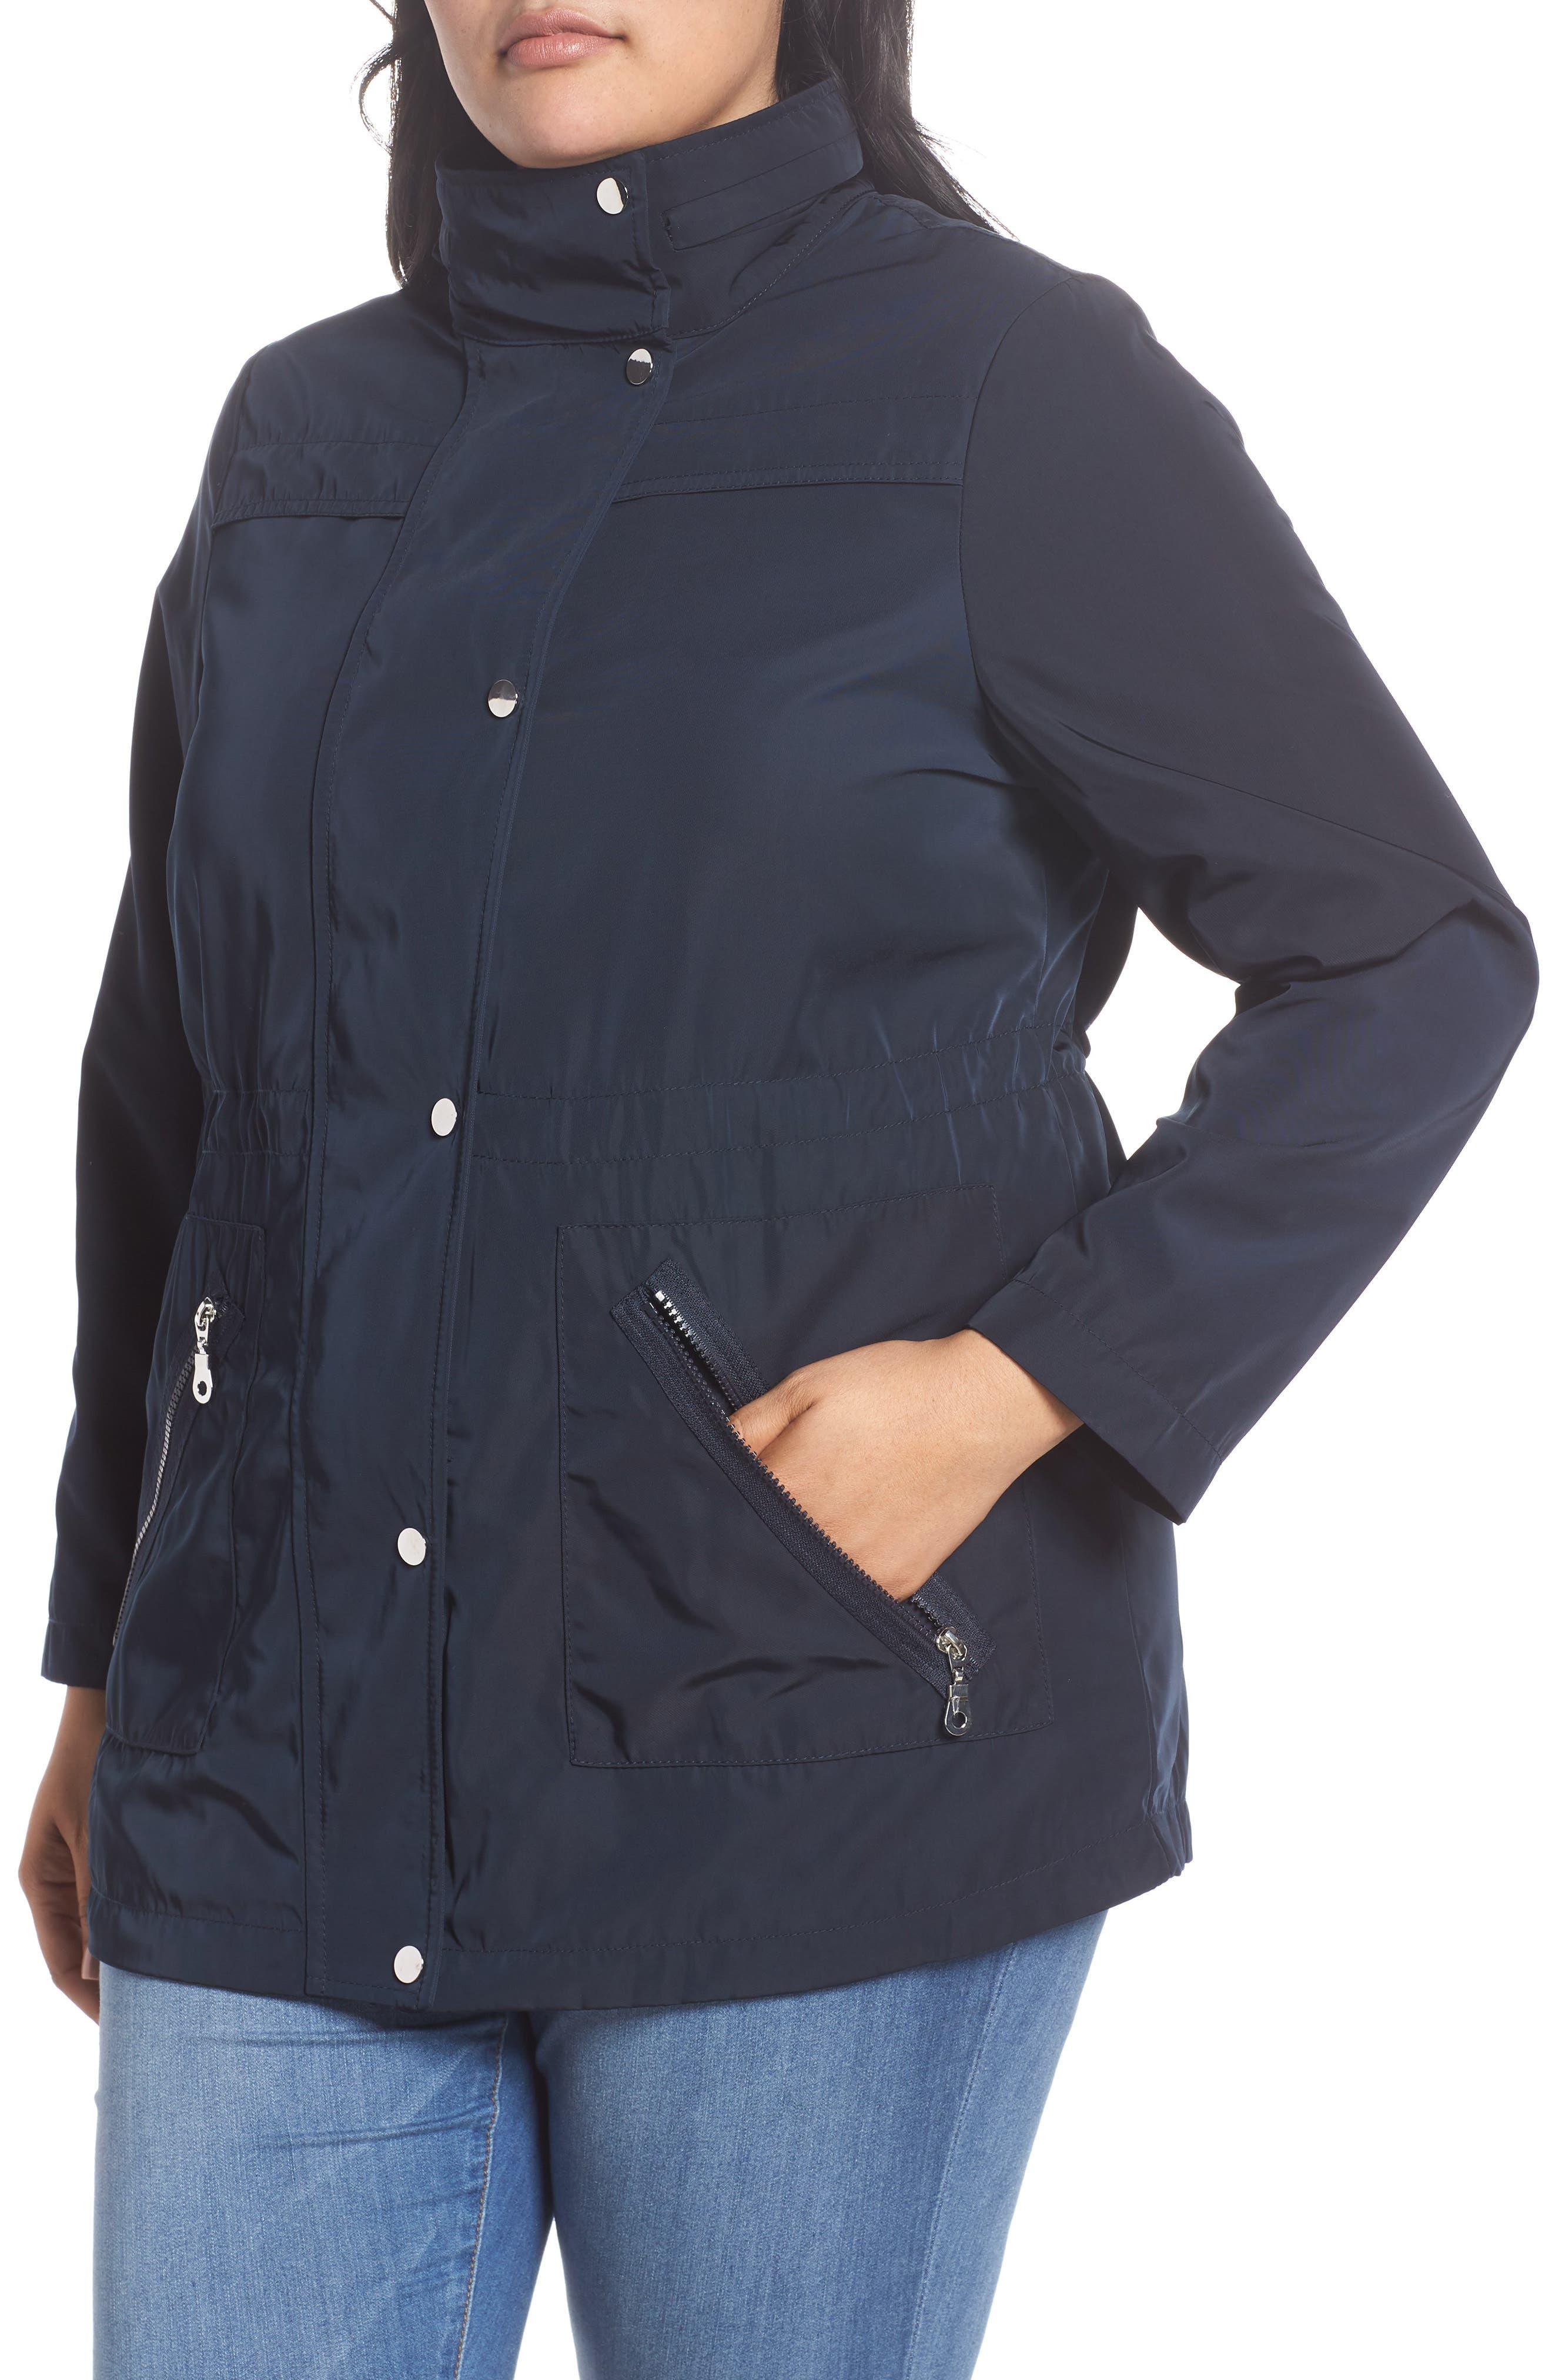 Zip Trim Jacket,                             Alternate thumbnail 8, color,                             Navy Blue